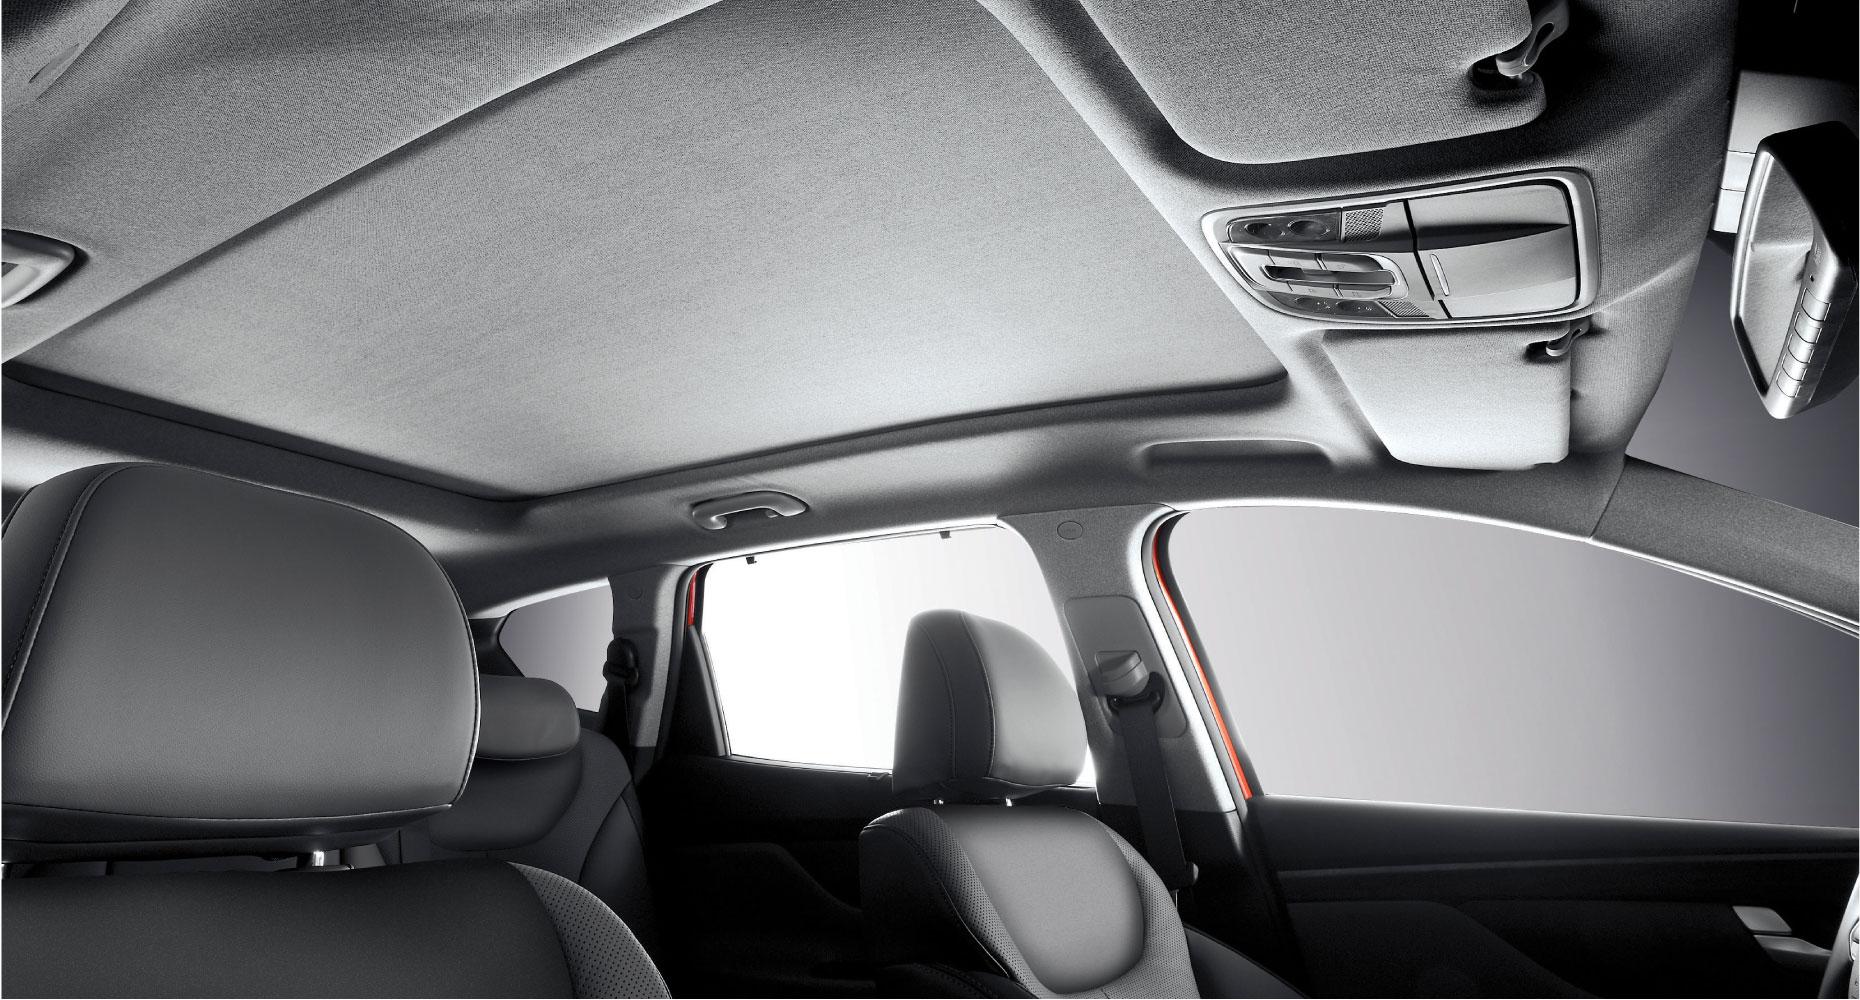 All-New 2019 Hyundai Santa Fe | SUV Crossover Utility Vehicle